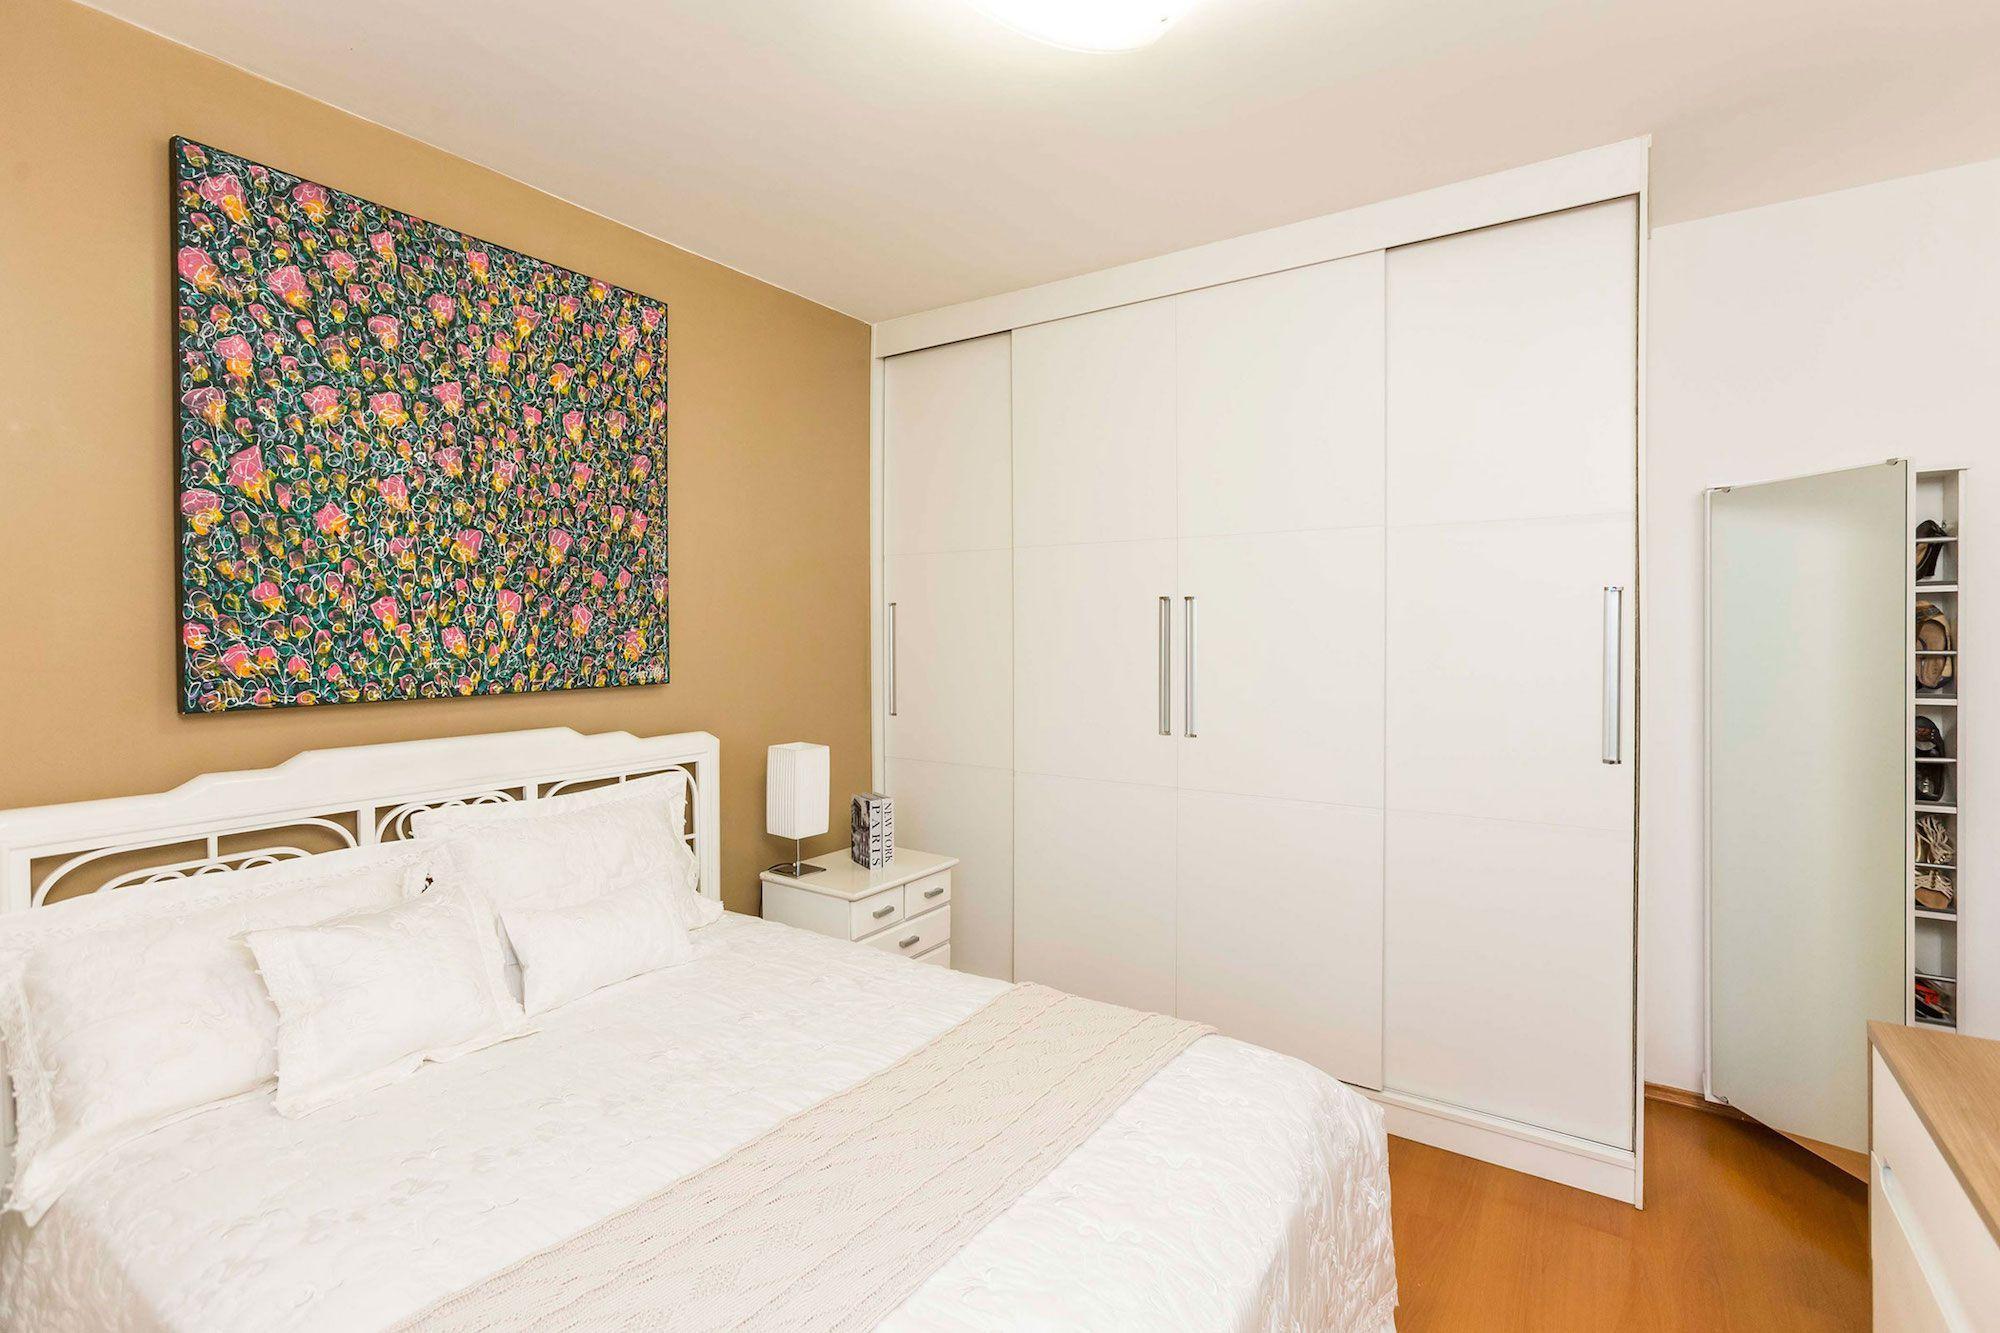 Granja-Julieta-Residence-29